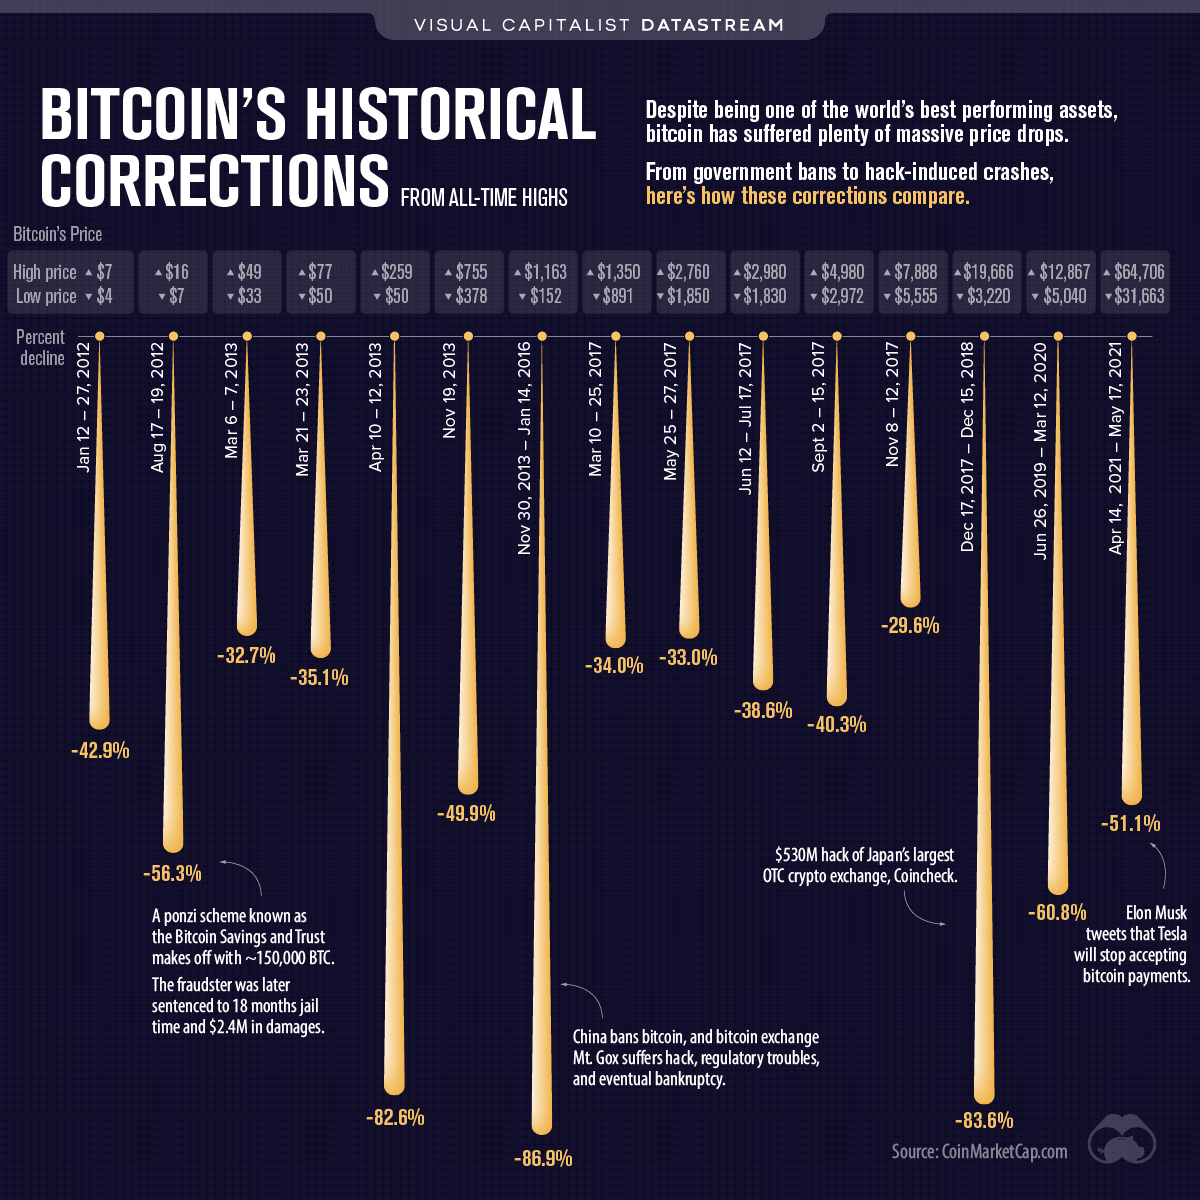 Bitcoin corrections